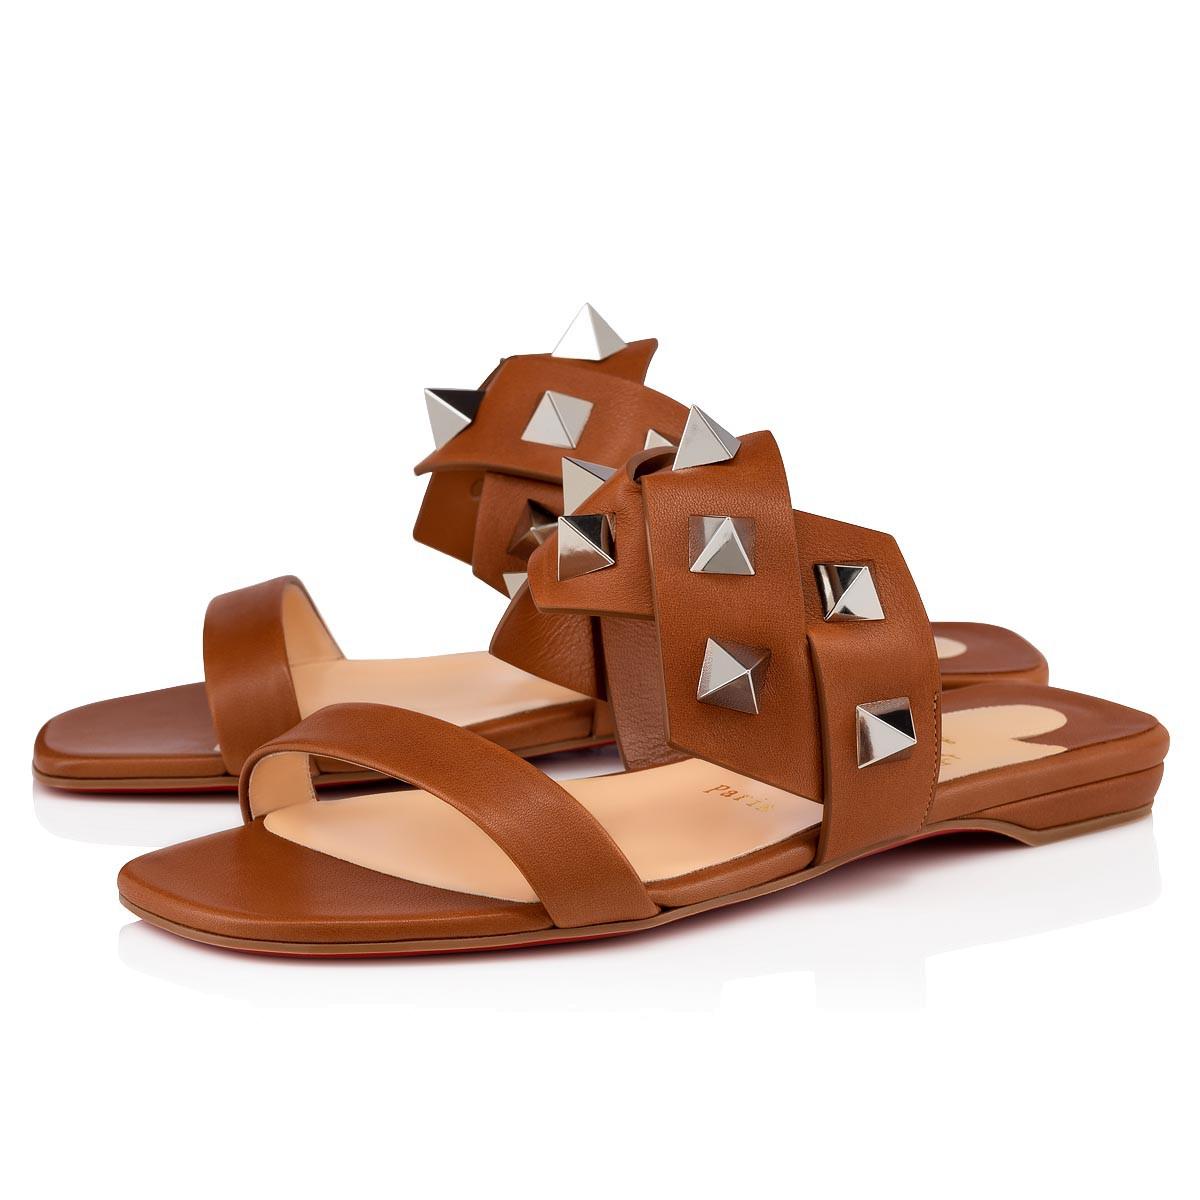 Shoes - Tina In The Desert Flat - Christian Louboutin